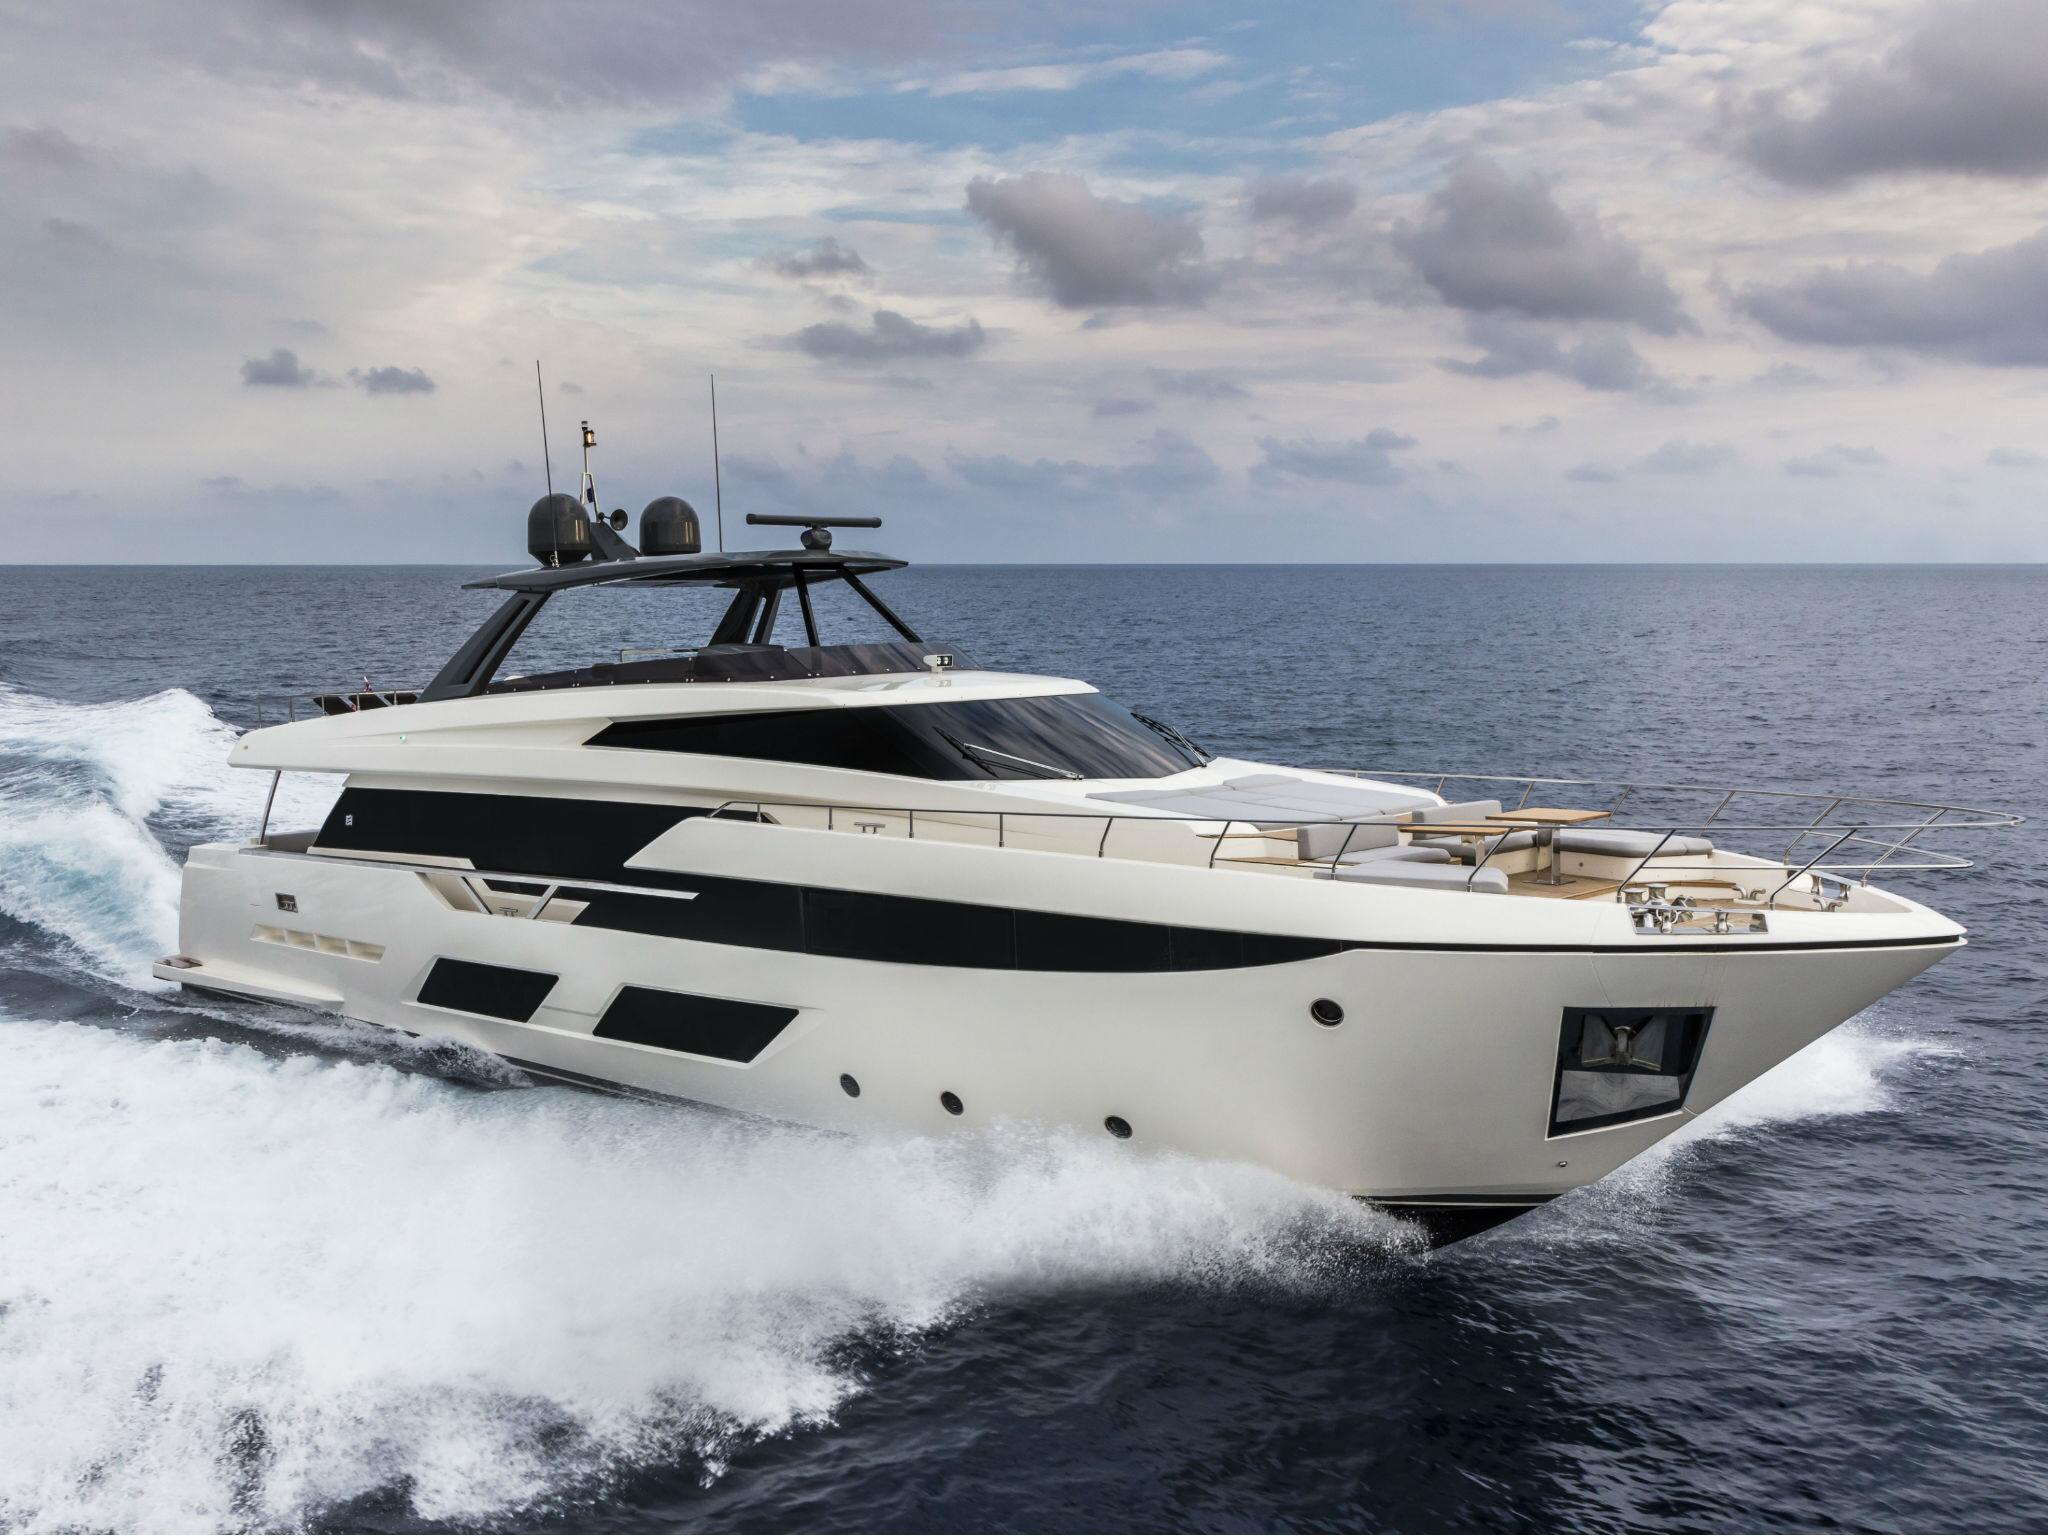 ferretti-yachts-920-ext-1